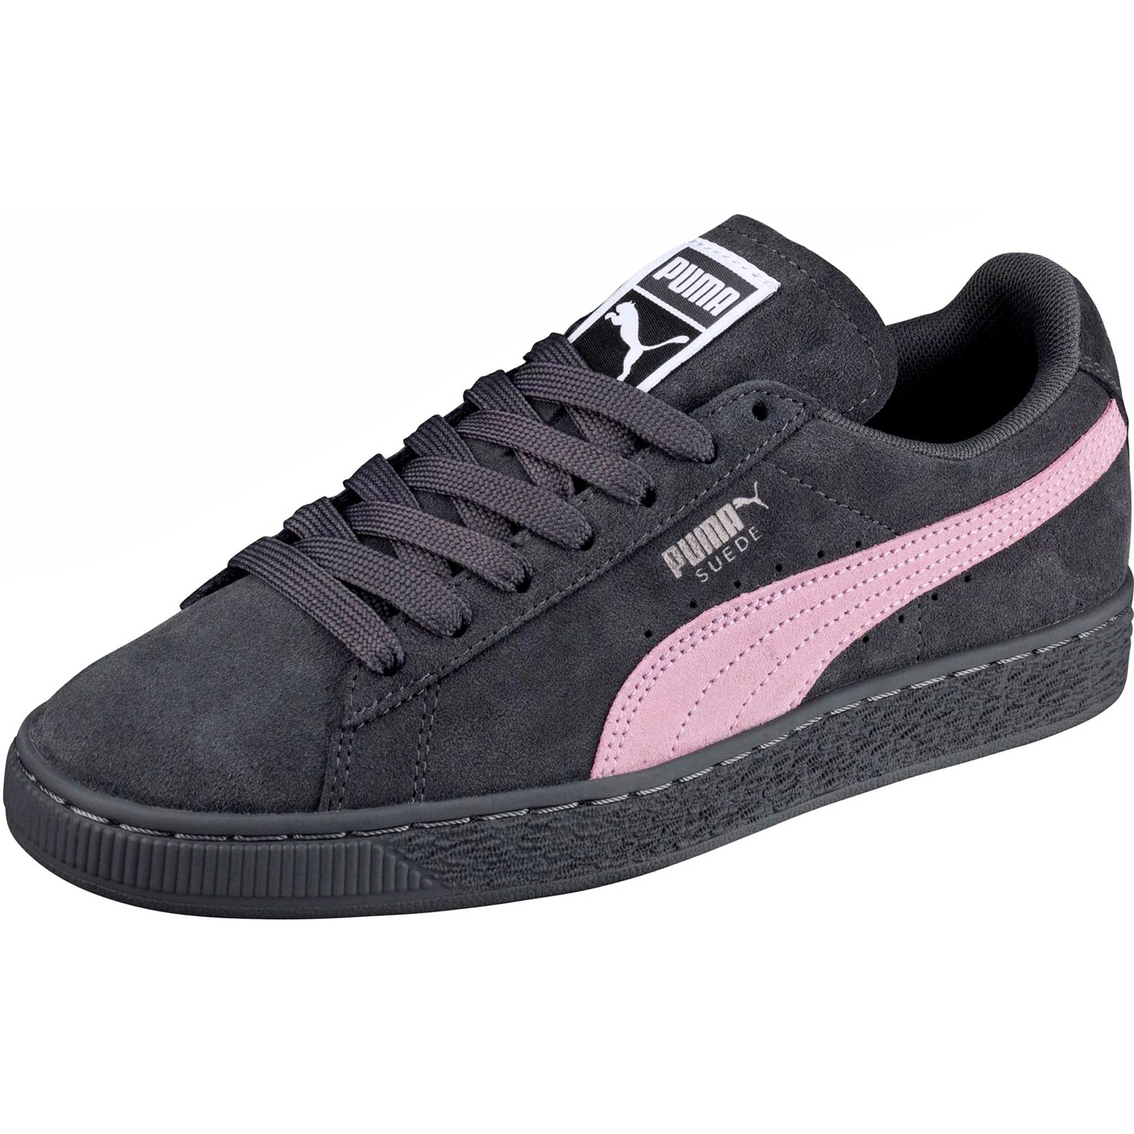 ab86ee3e471c Puma Suede Classics Sneakers